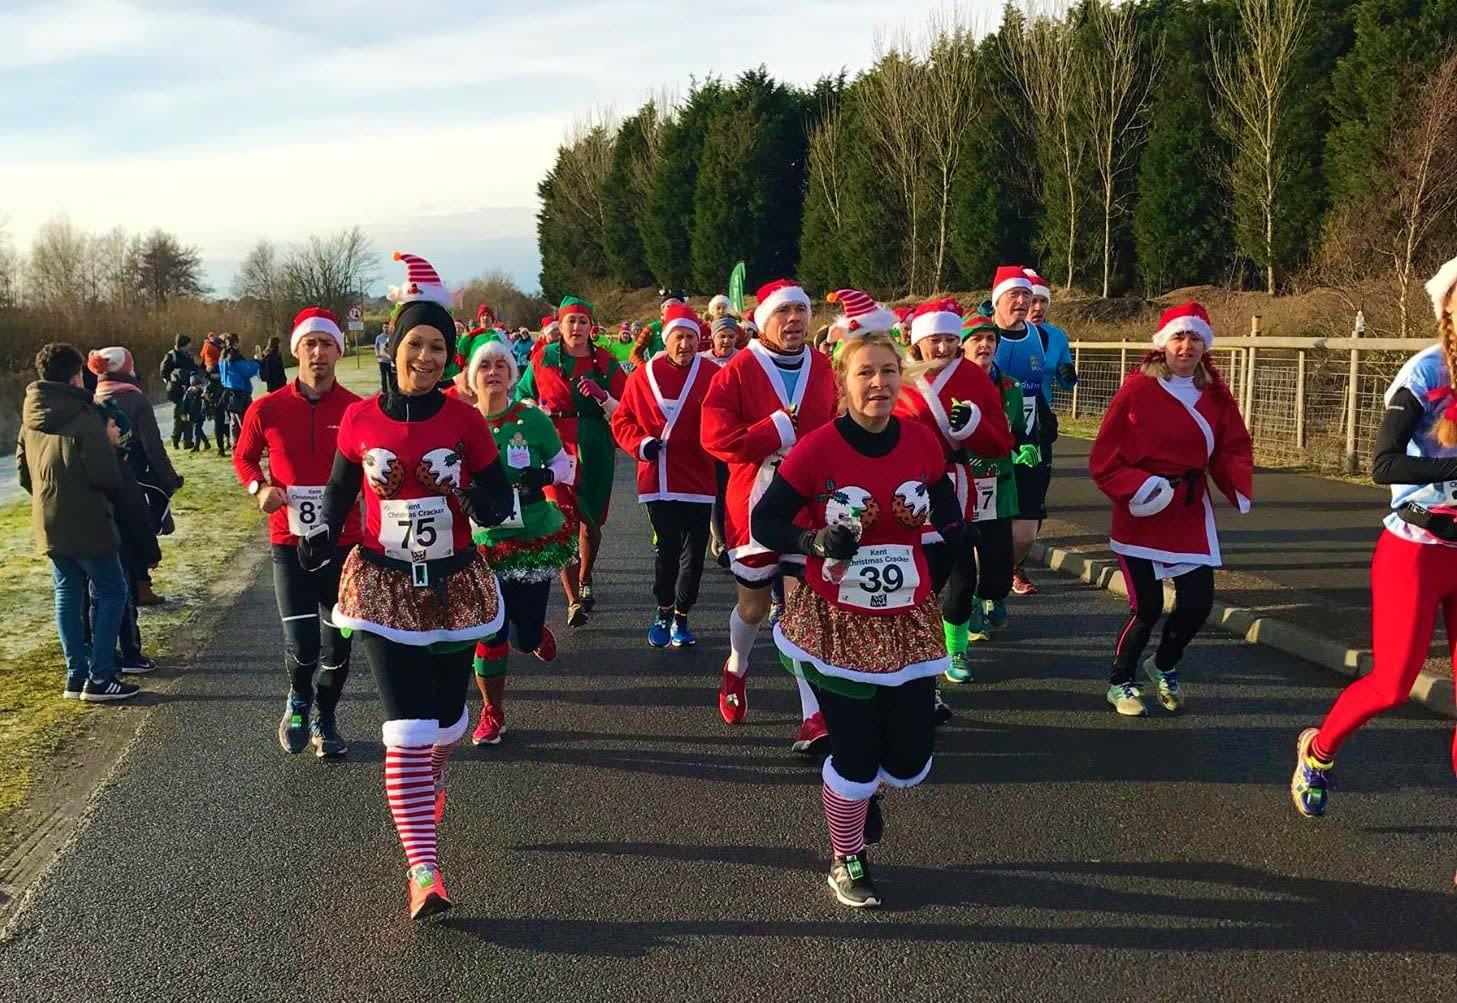 The Kent Christmas Cracker 5 Mile